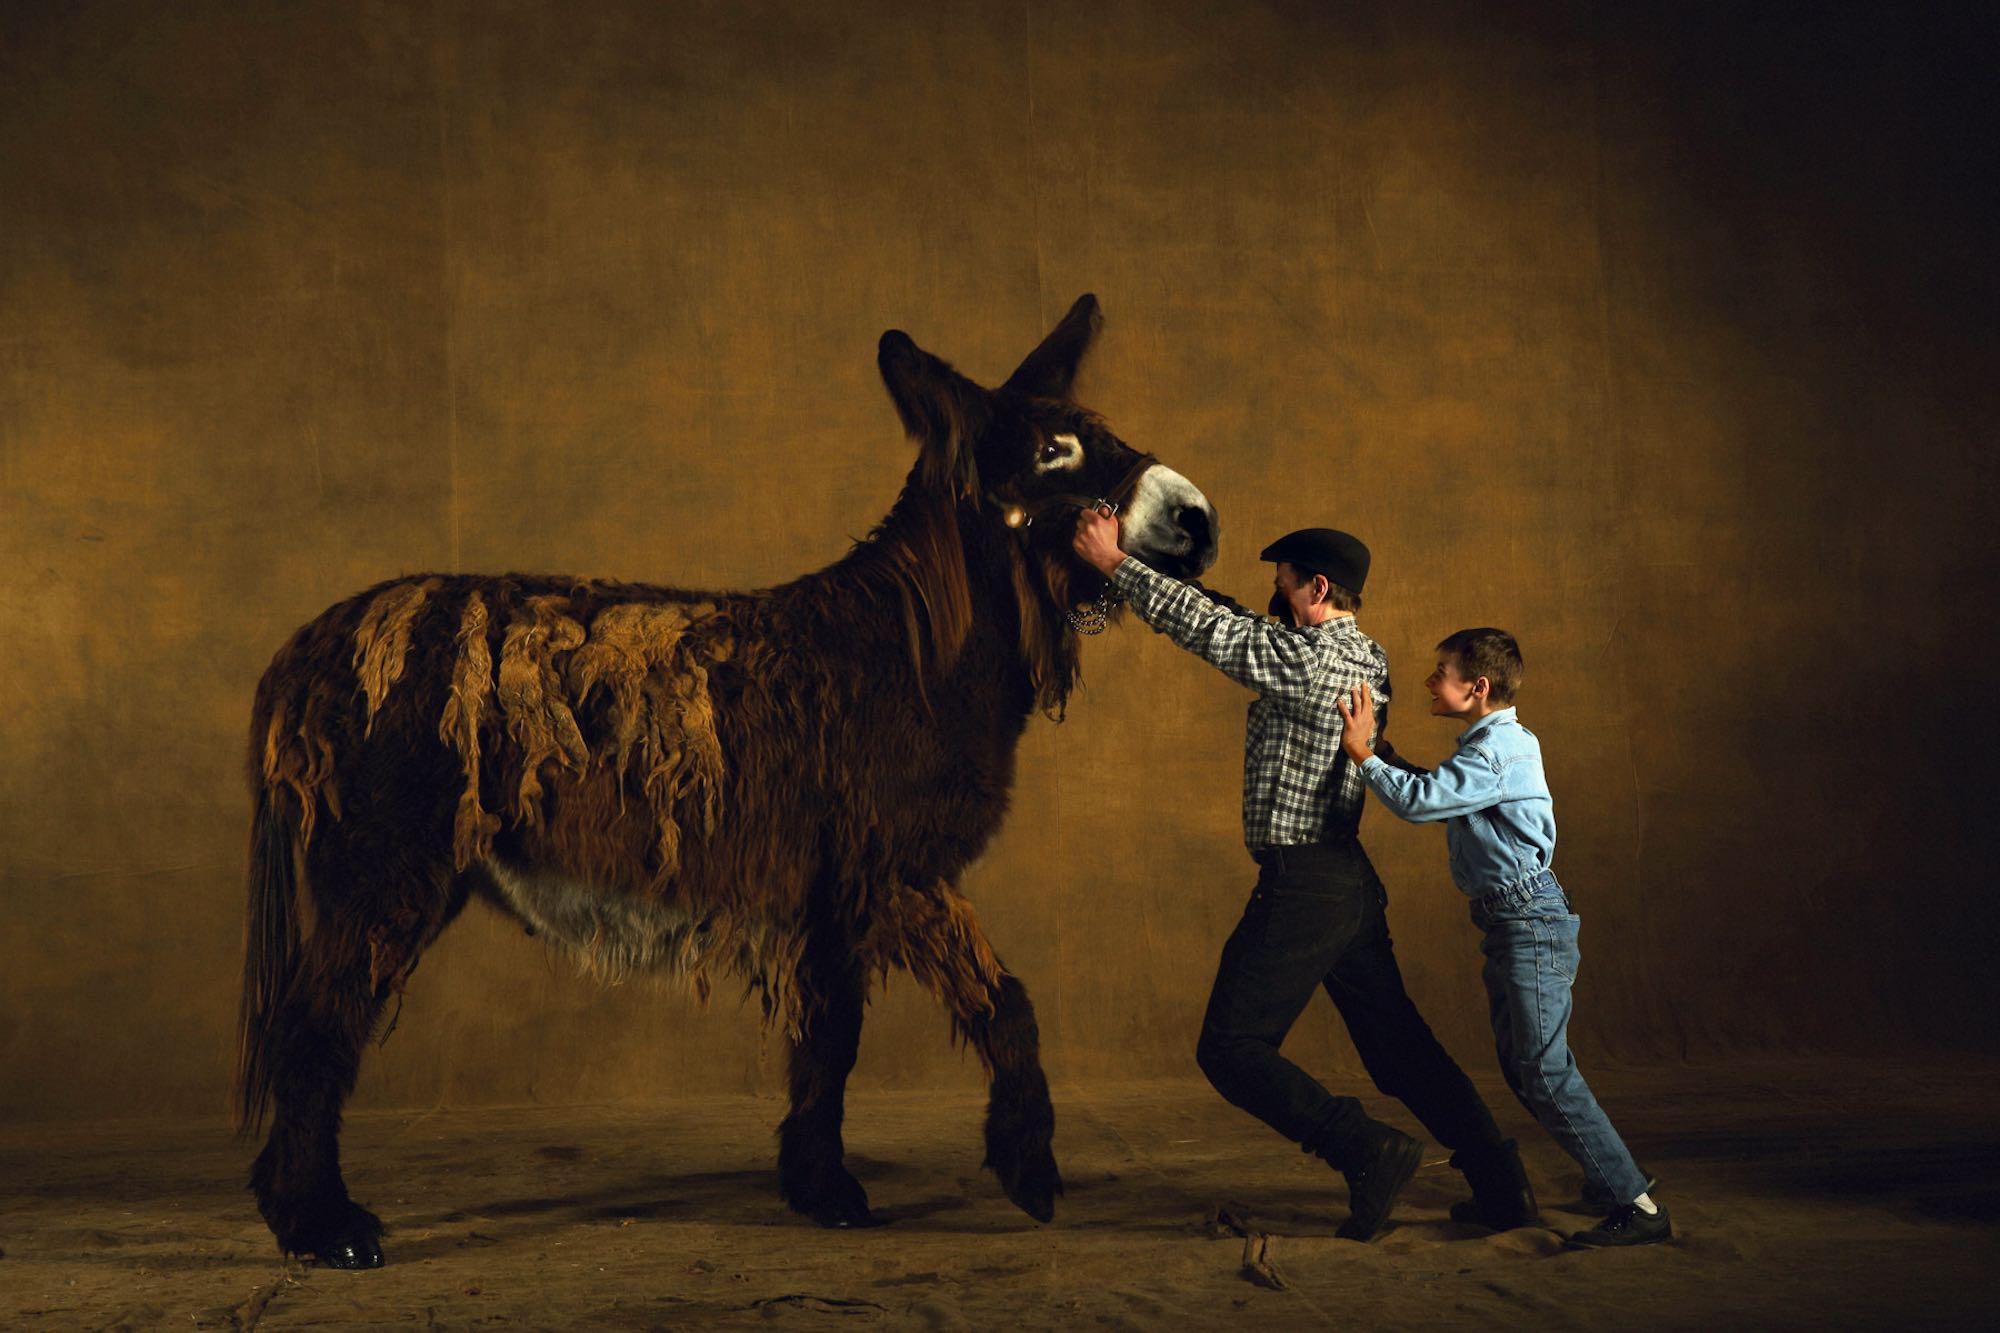 Poitou donkey mare - Yann Arthus-Bertrand